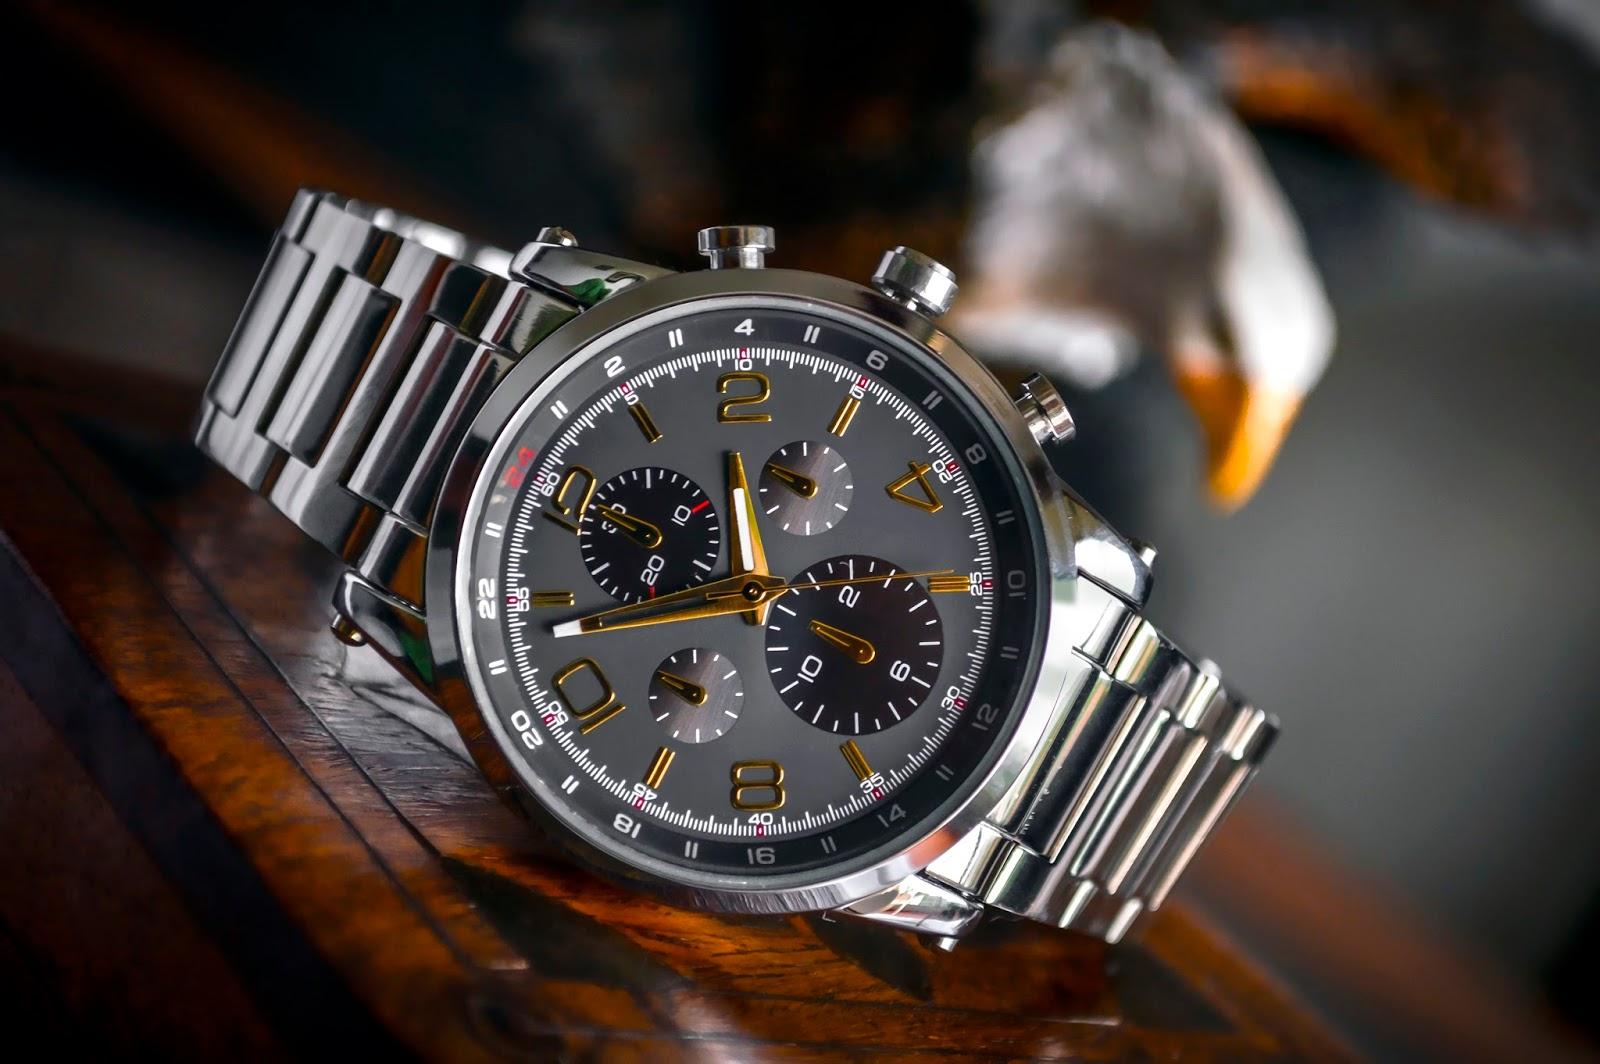 cool metallic wrist watch